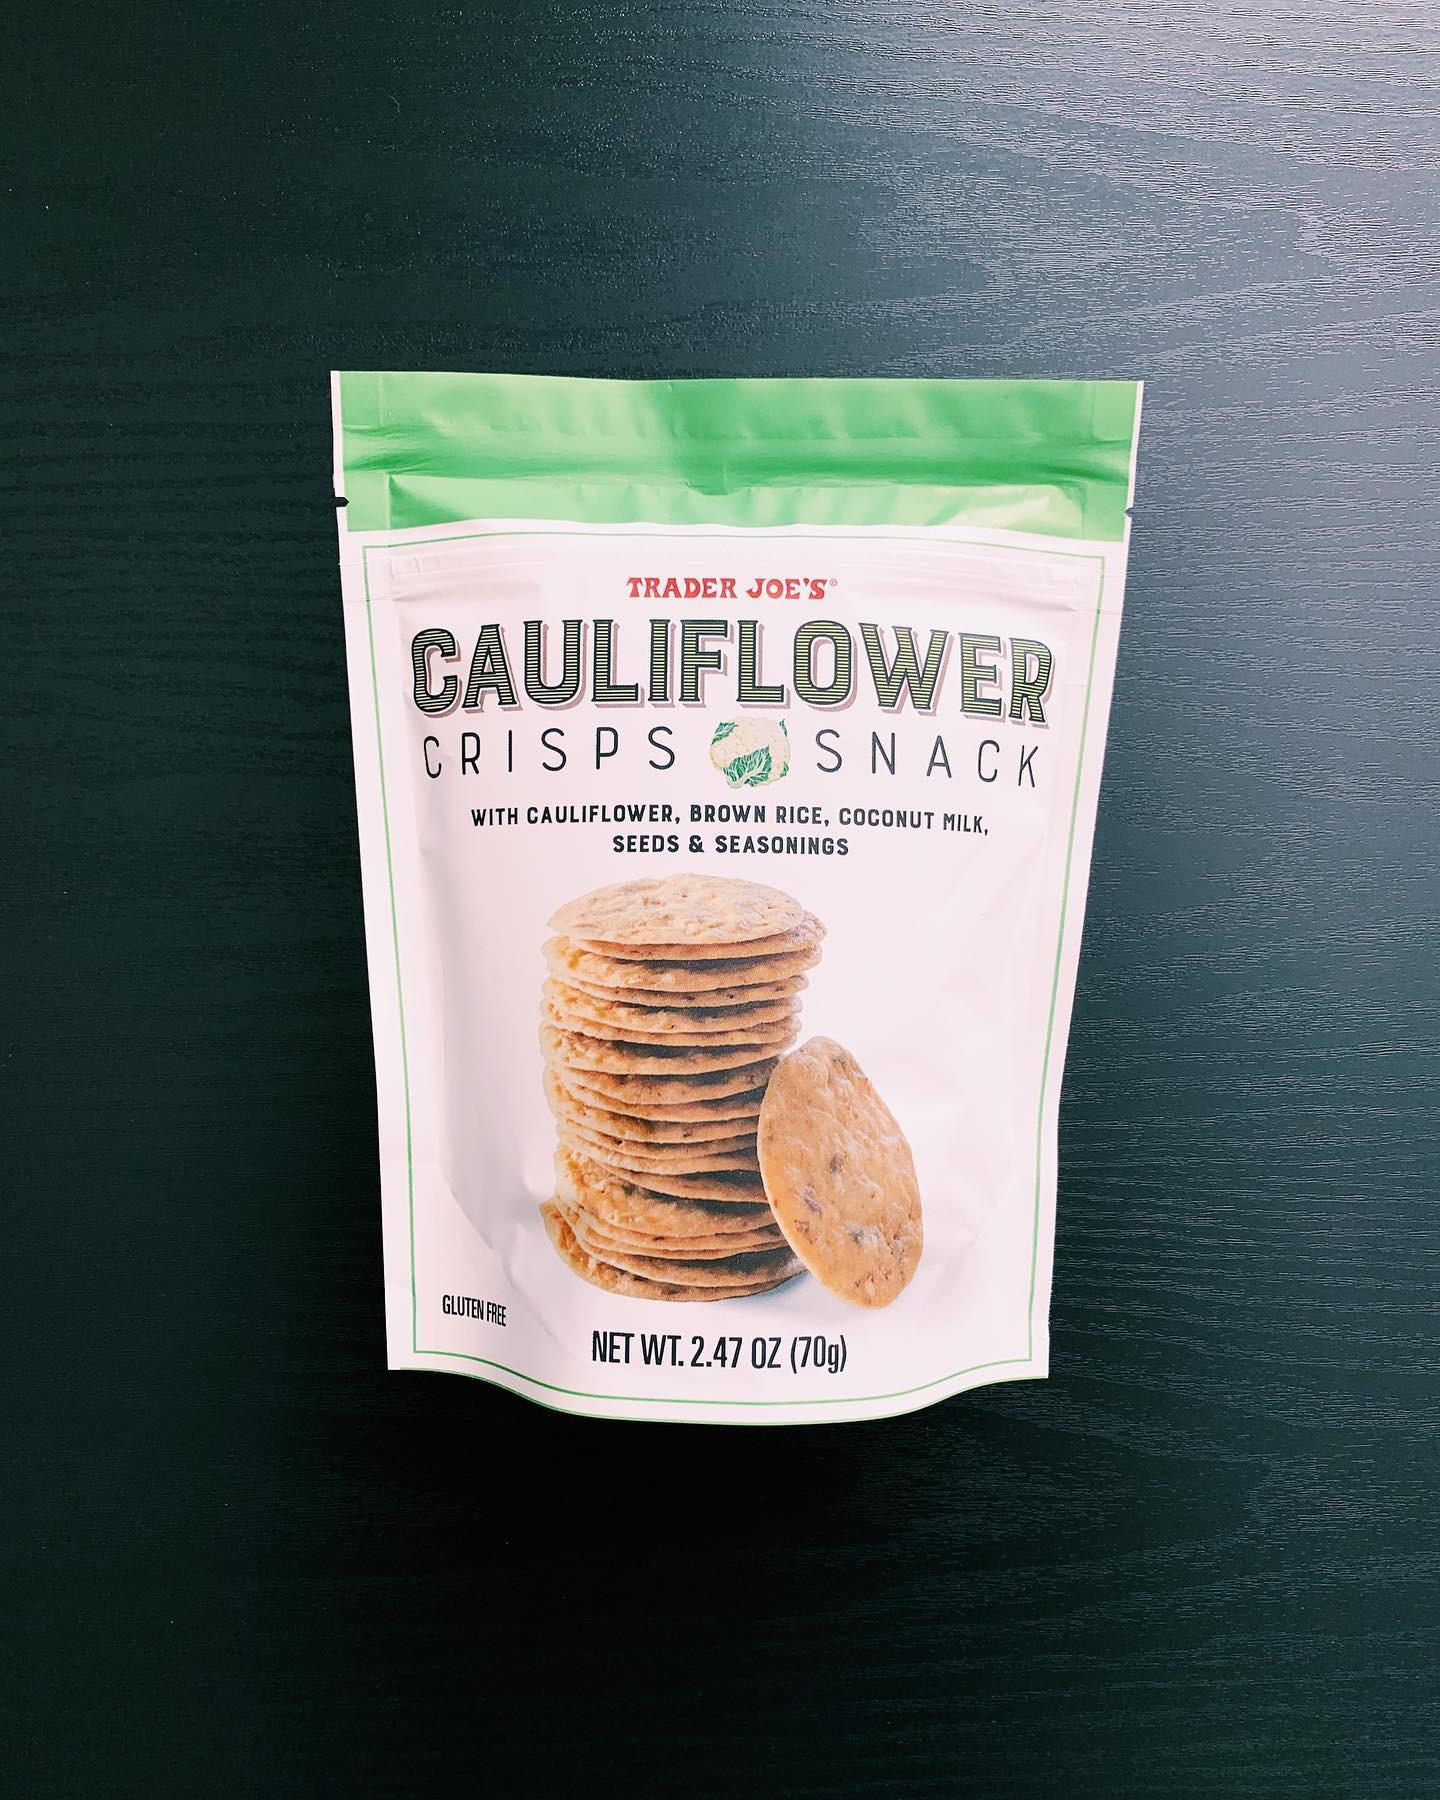 Cauliflower Crisps: 7/10